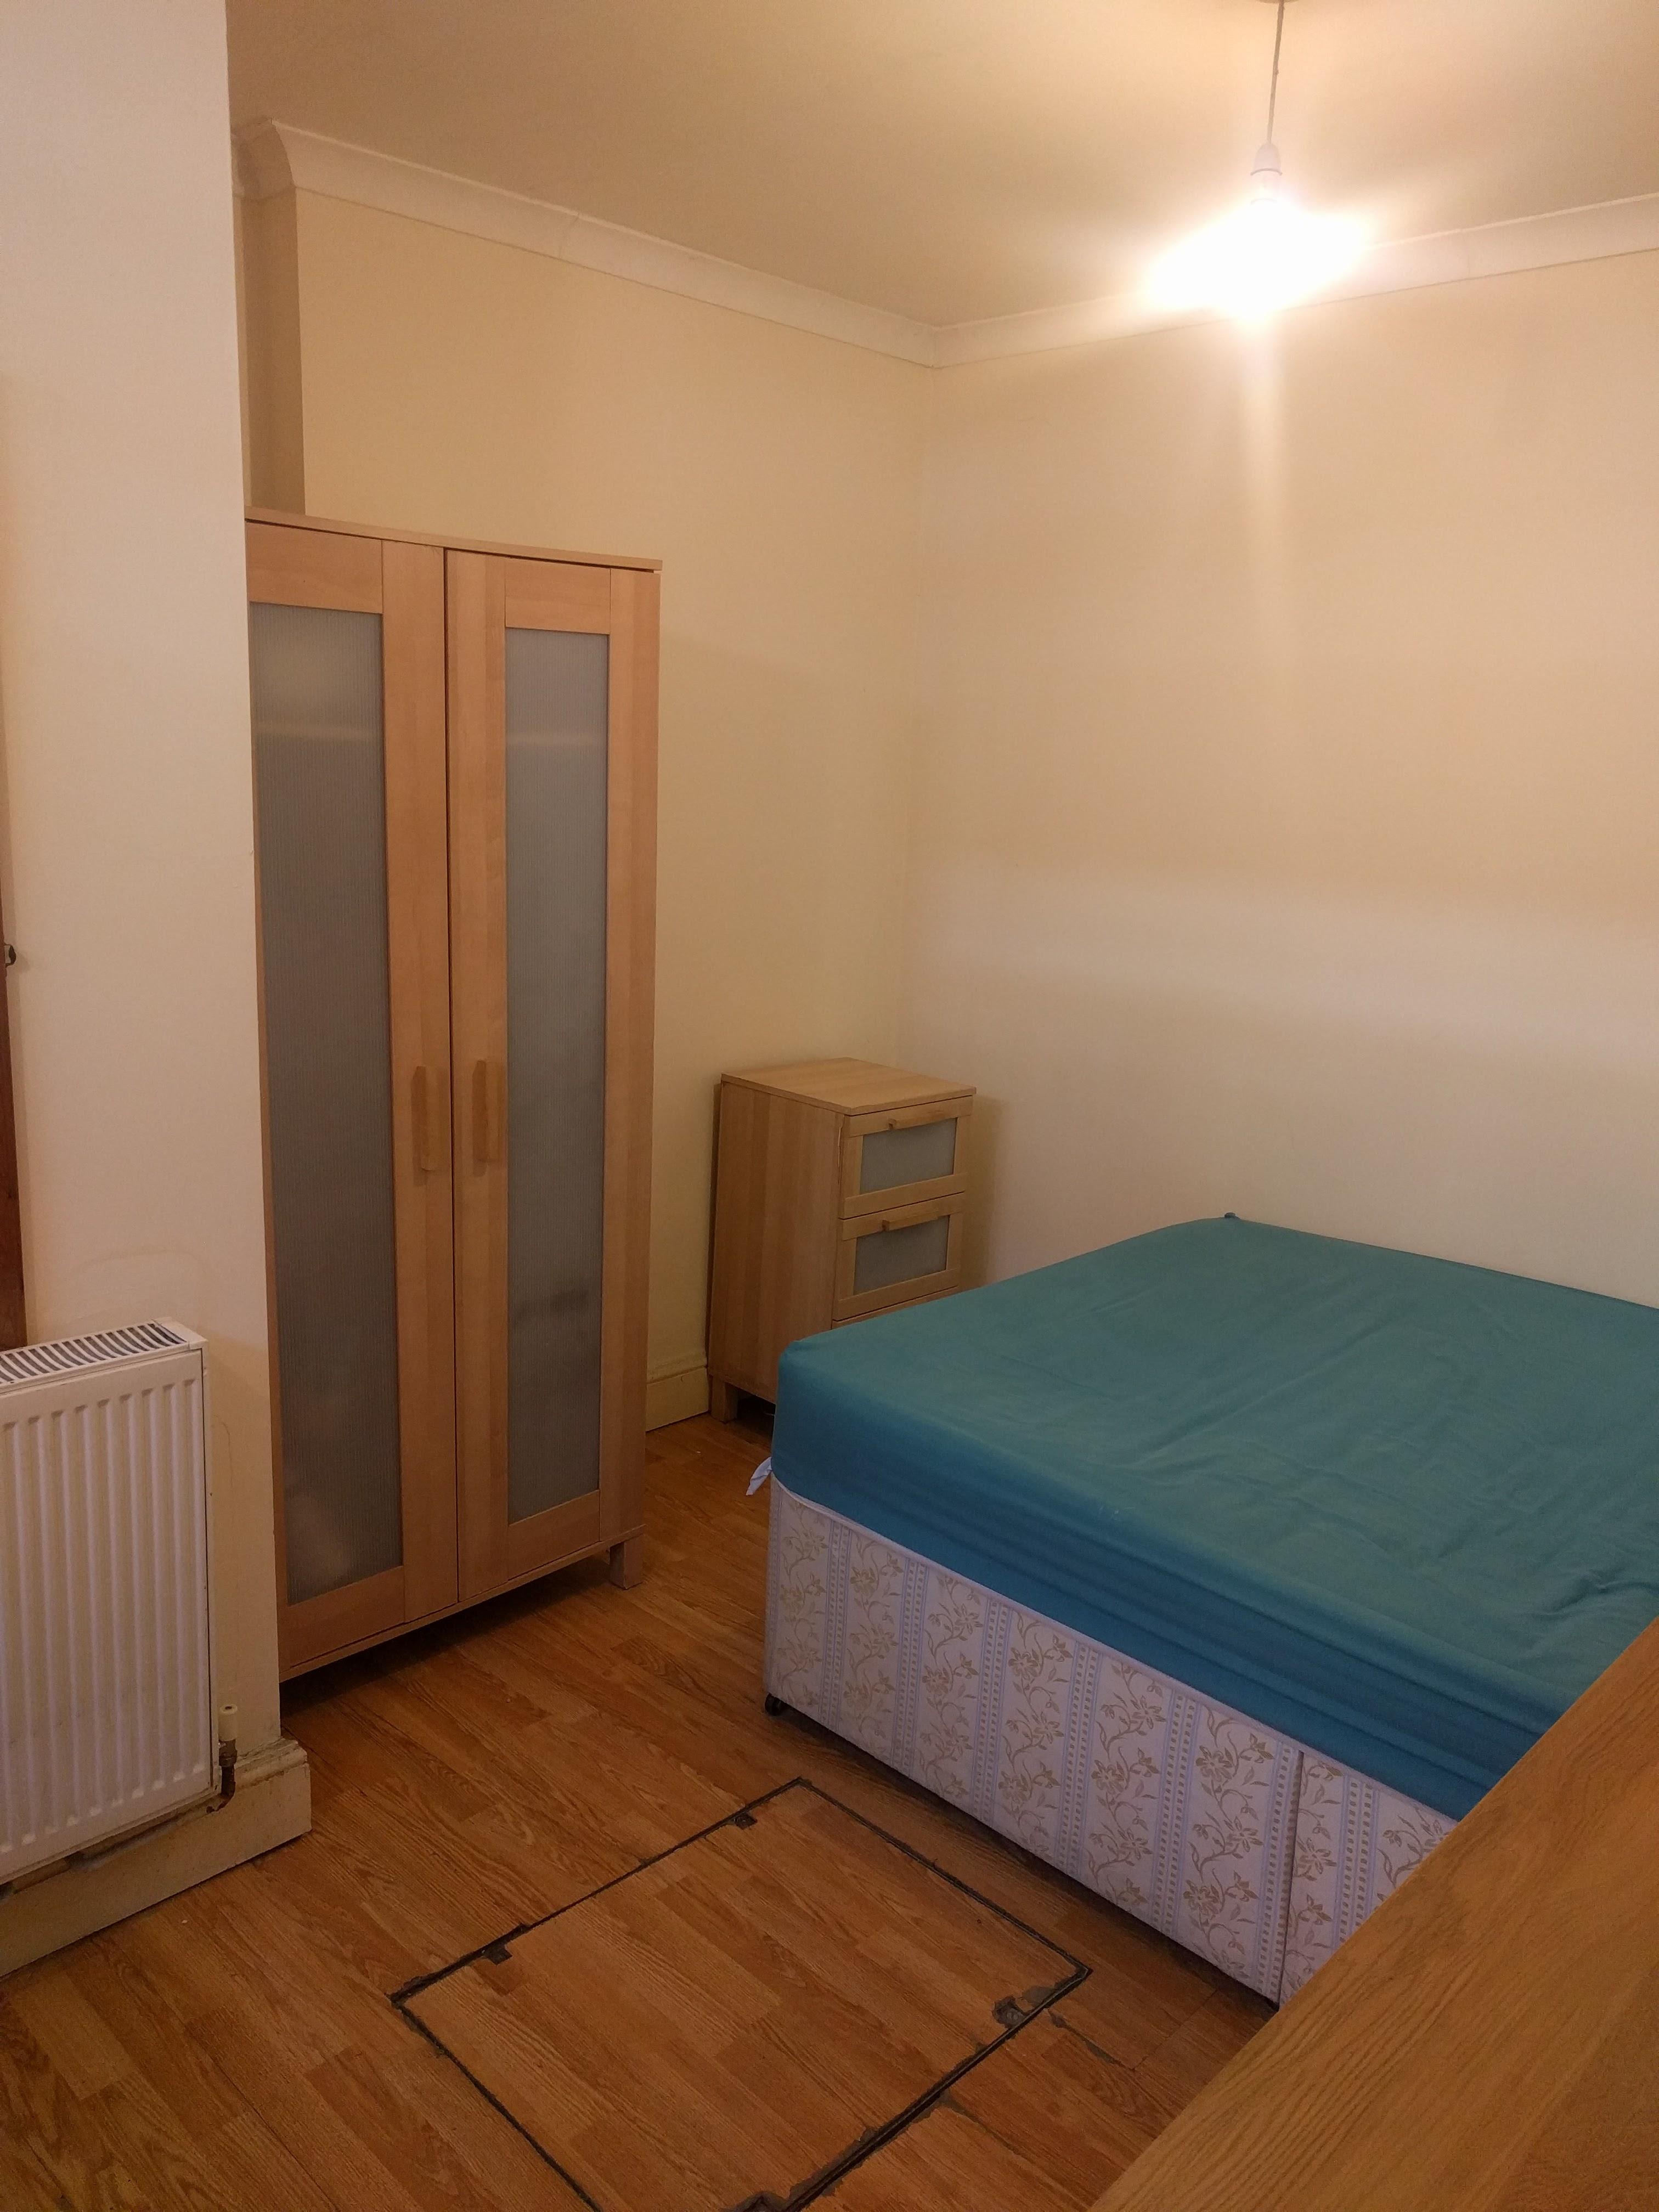 Hammersmith Double Room Rent